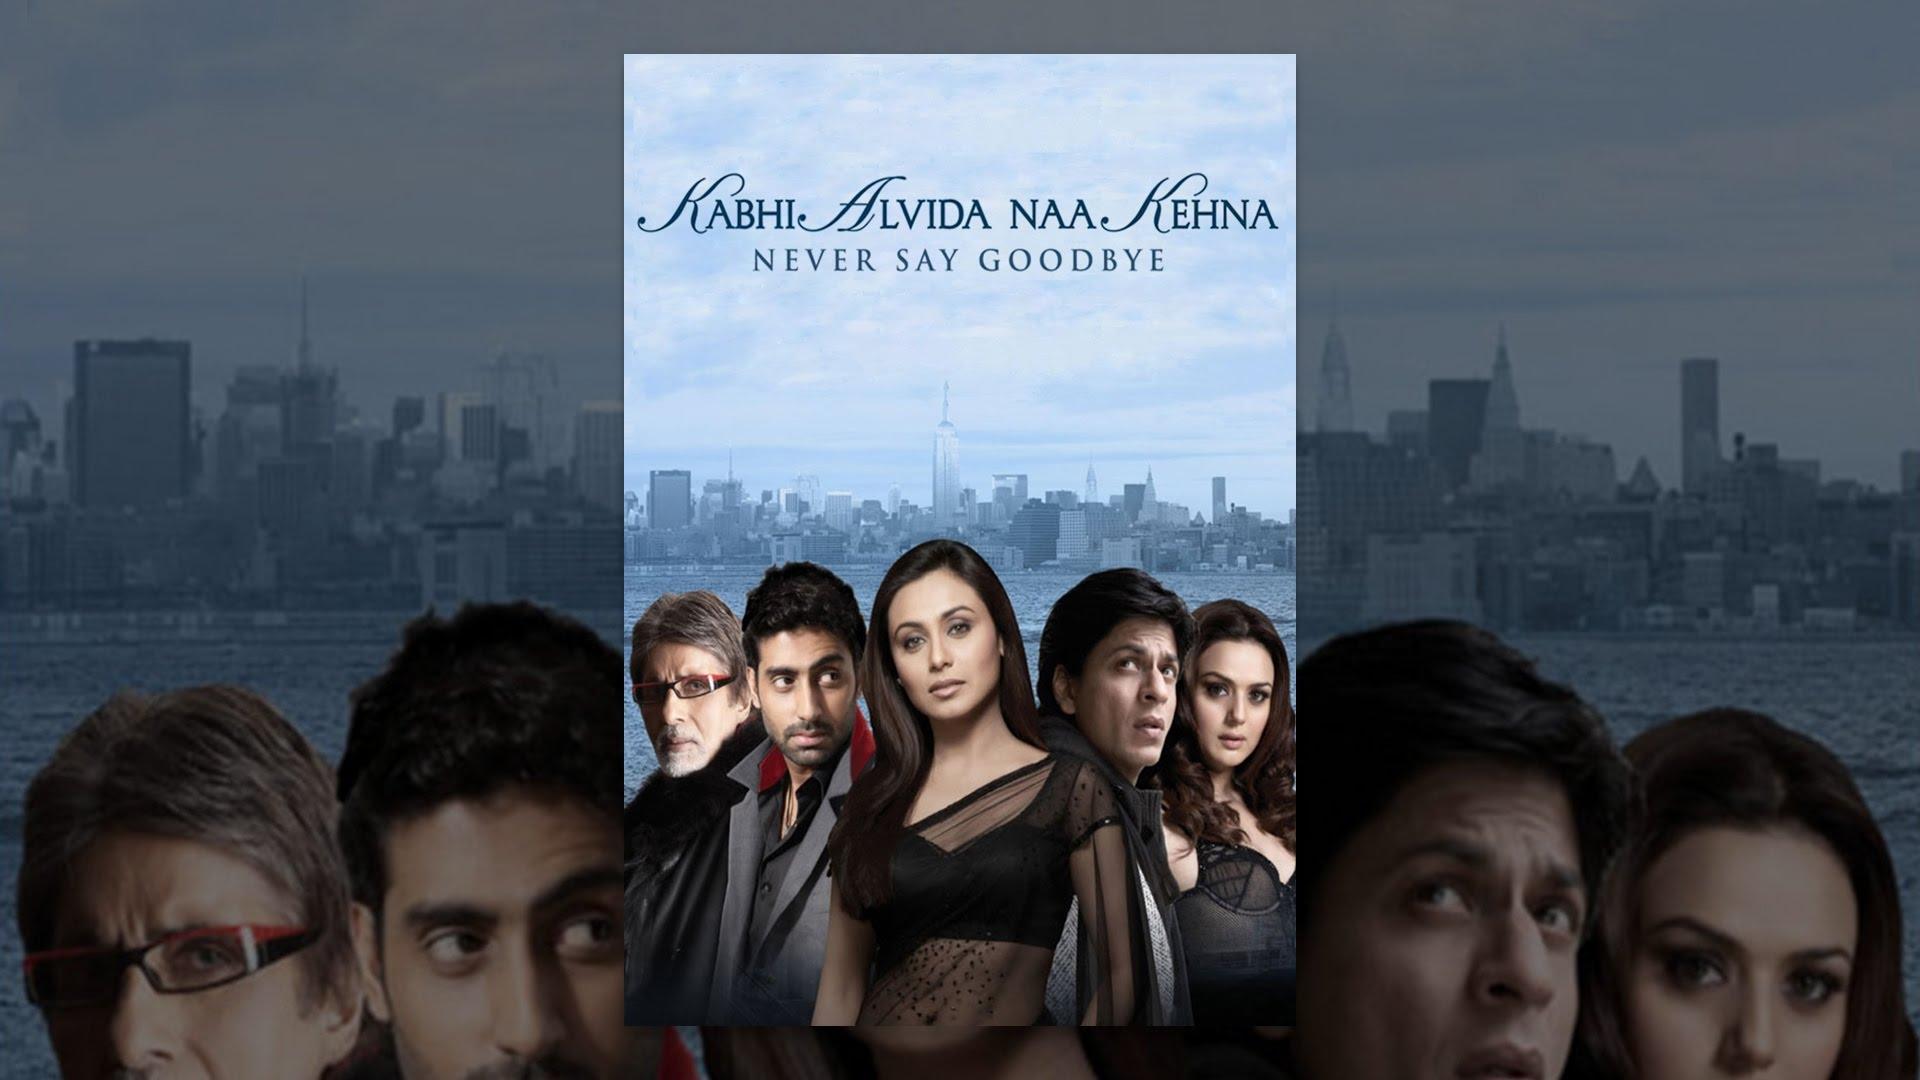 Download Kabhi Alvida Naa Kehna